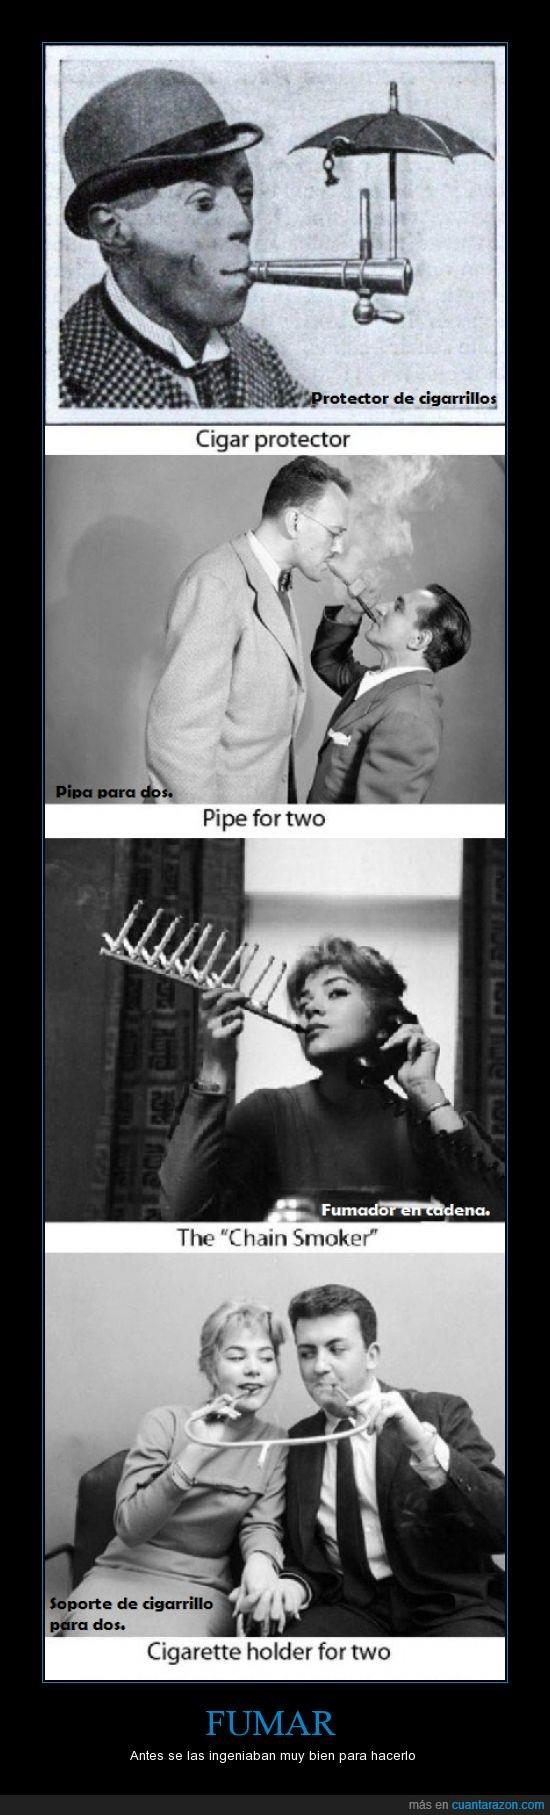 cigarrillos,Fumar,hacer,ingeniar